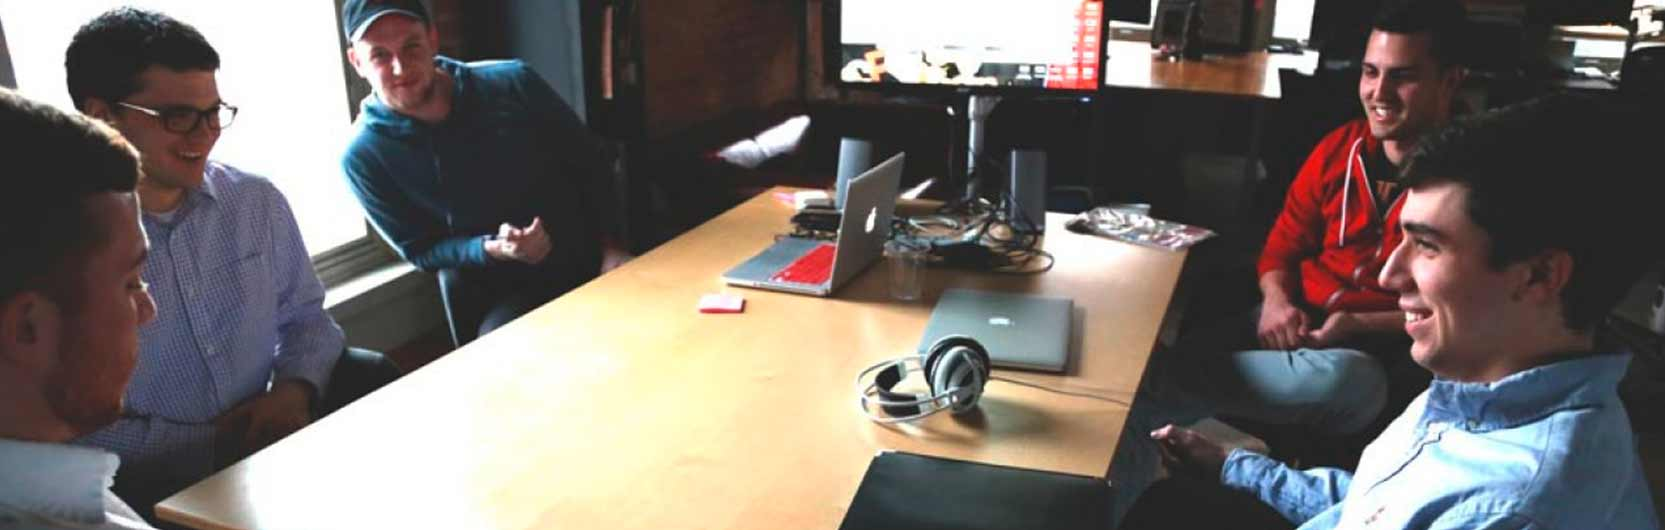 Co-Working Spaces | 5-HT Digital Hub Chemistry & Health